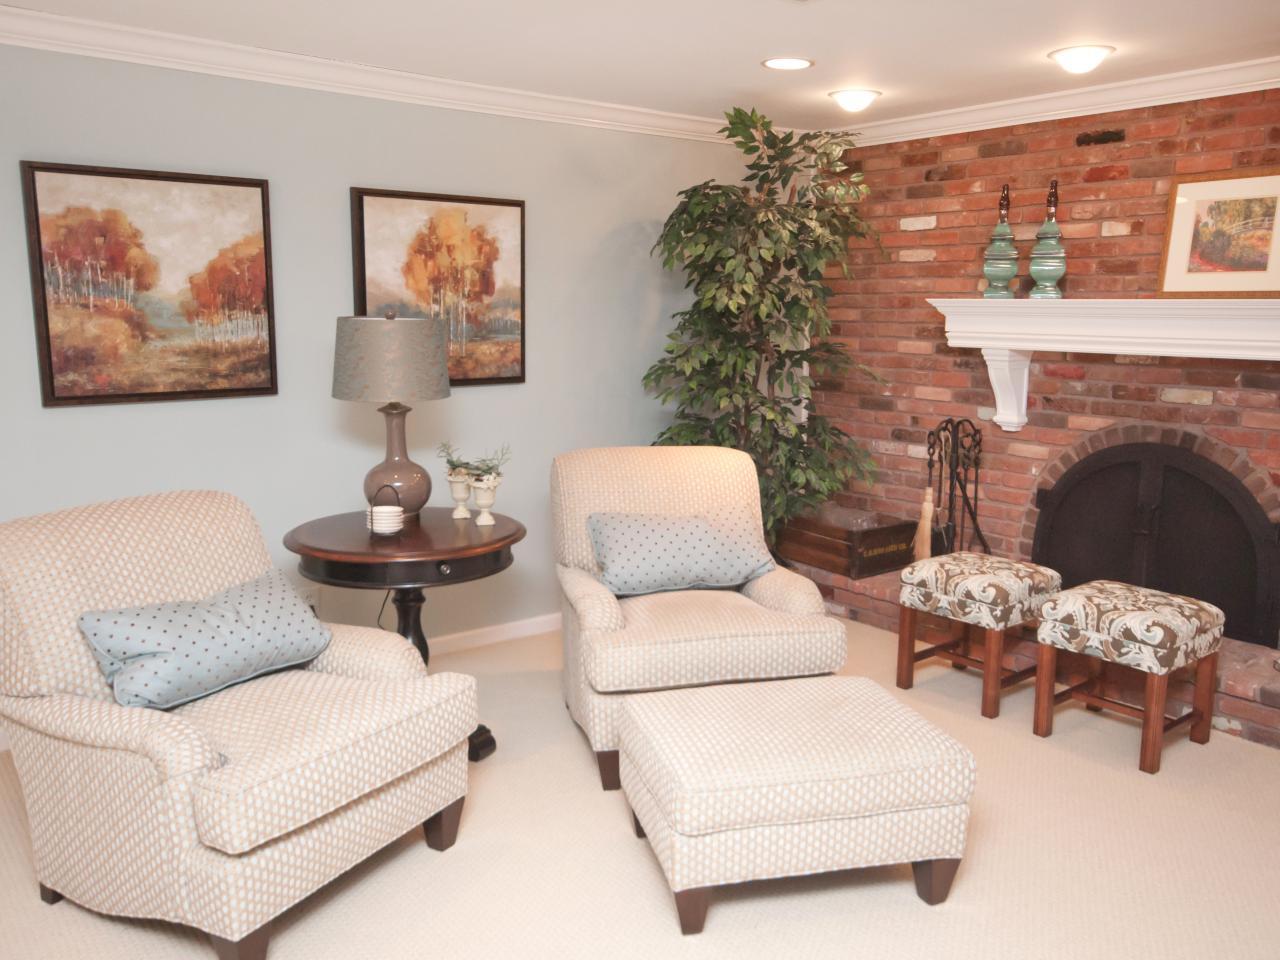 photos hgtv herringbone brick fireplace brick fireplace and mantel fireplace design and ideas - Living Room Ideas With Red Brick Fireplace